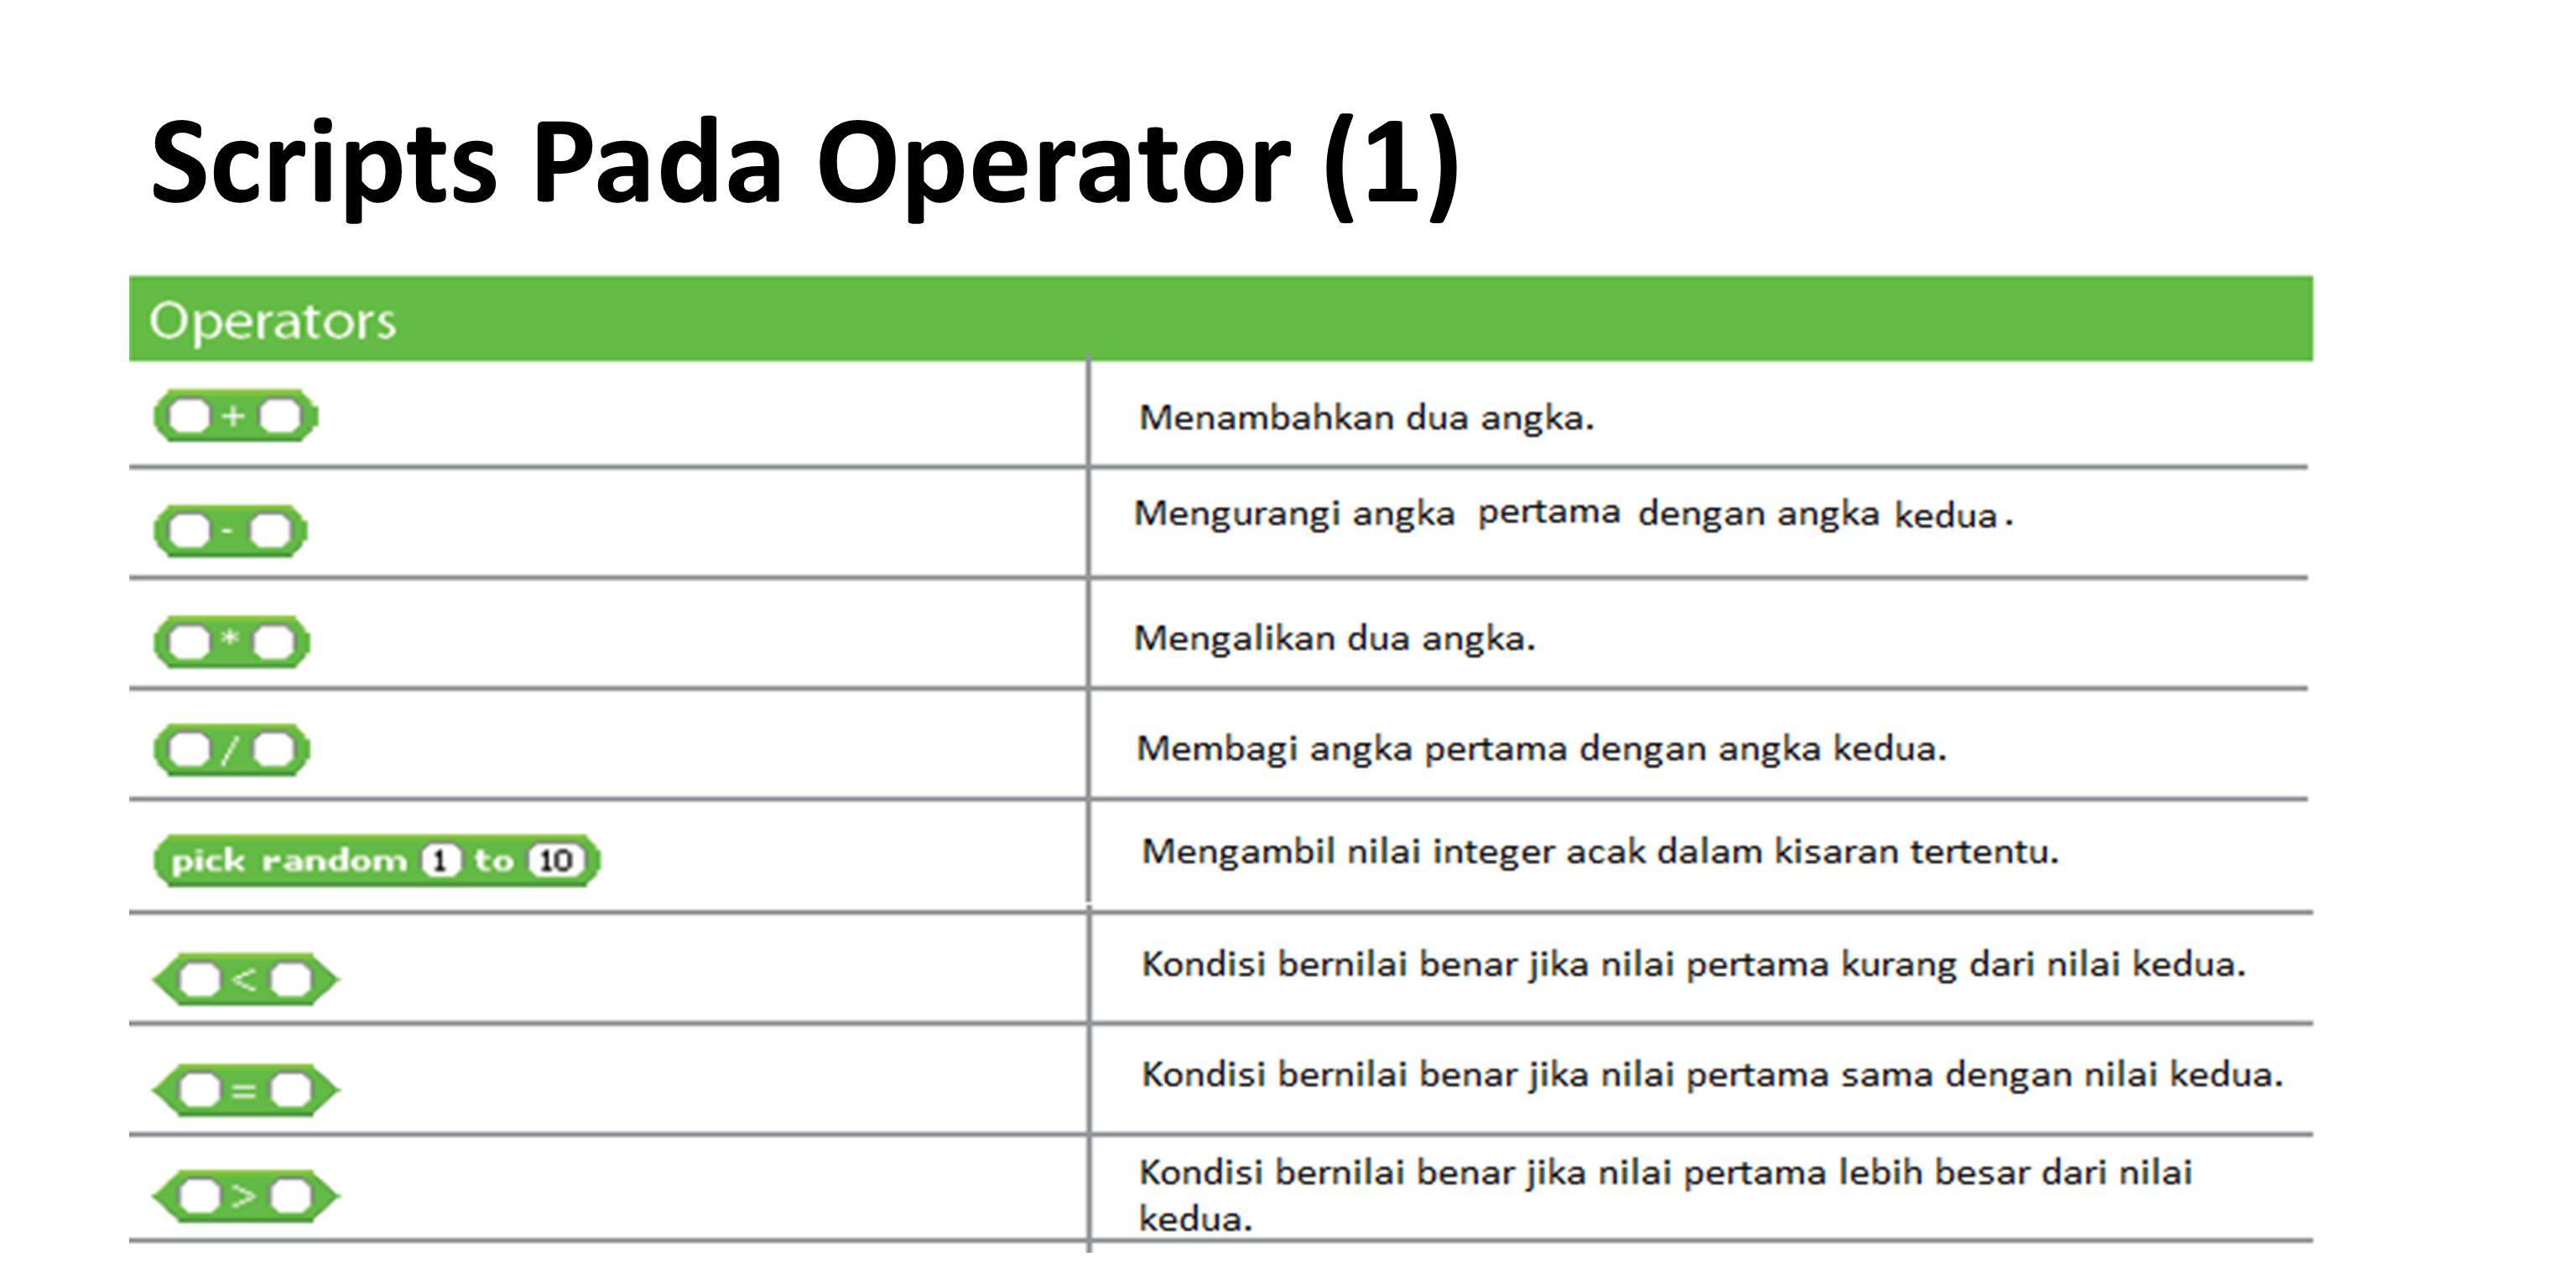 Scripts Pada Operator (1)